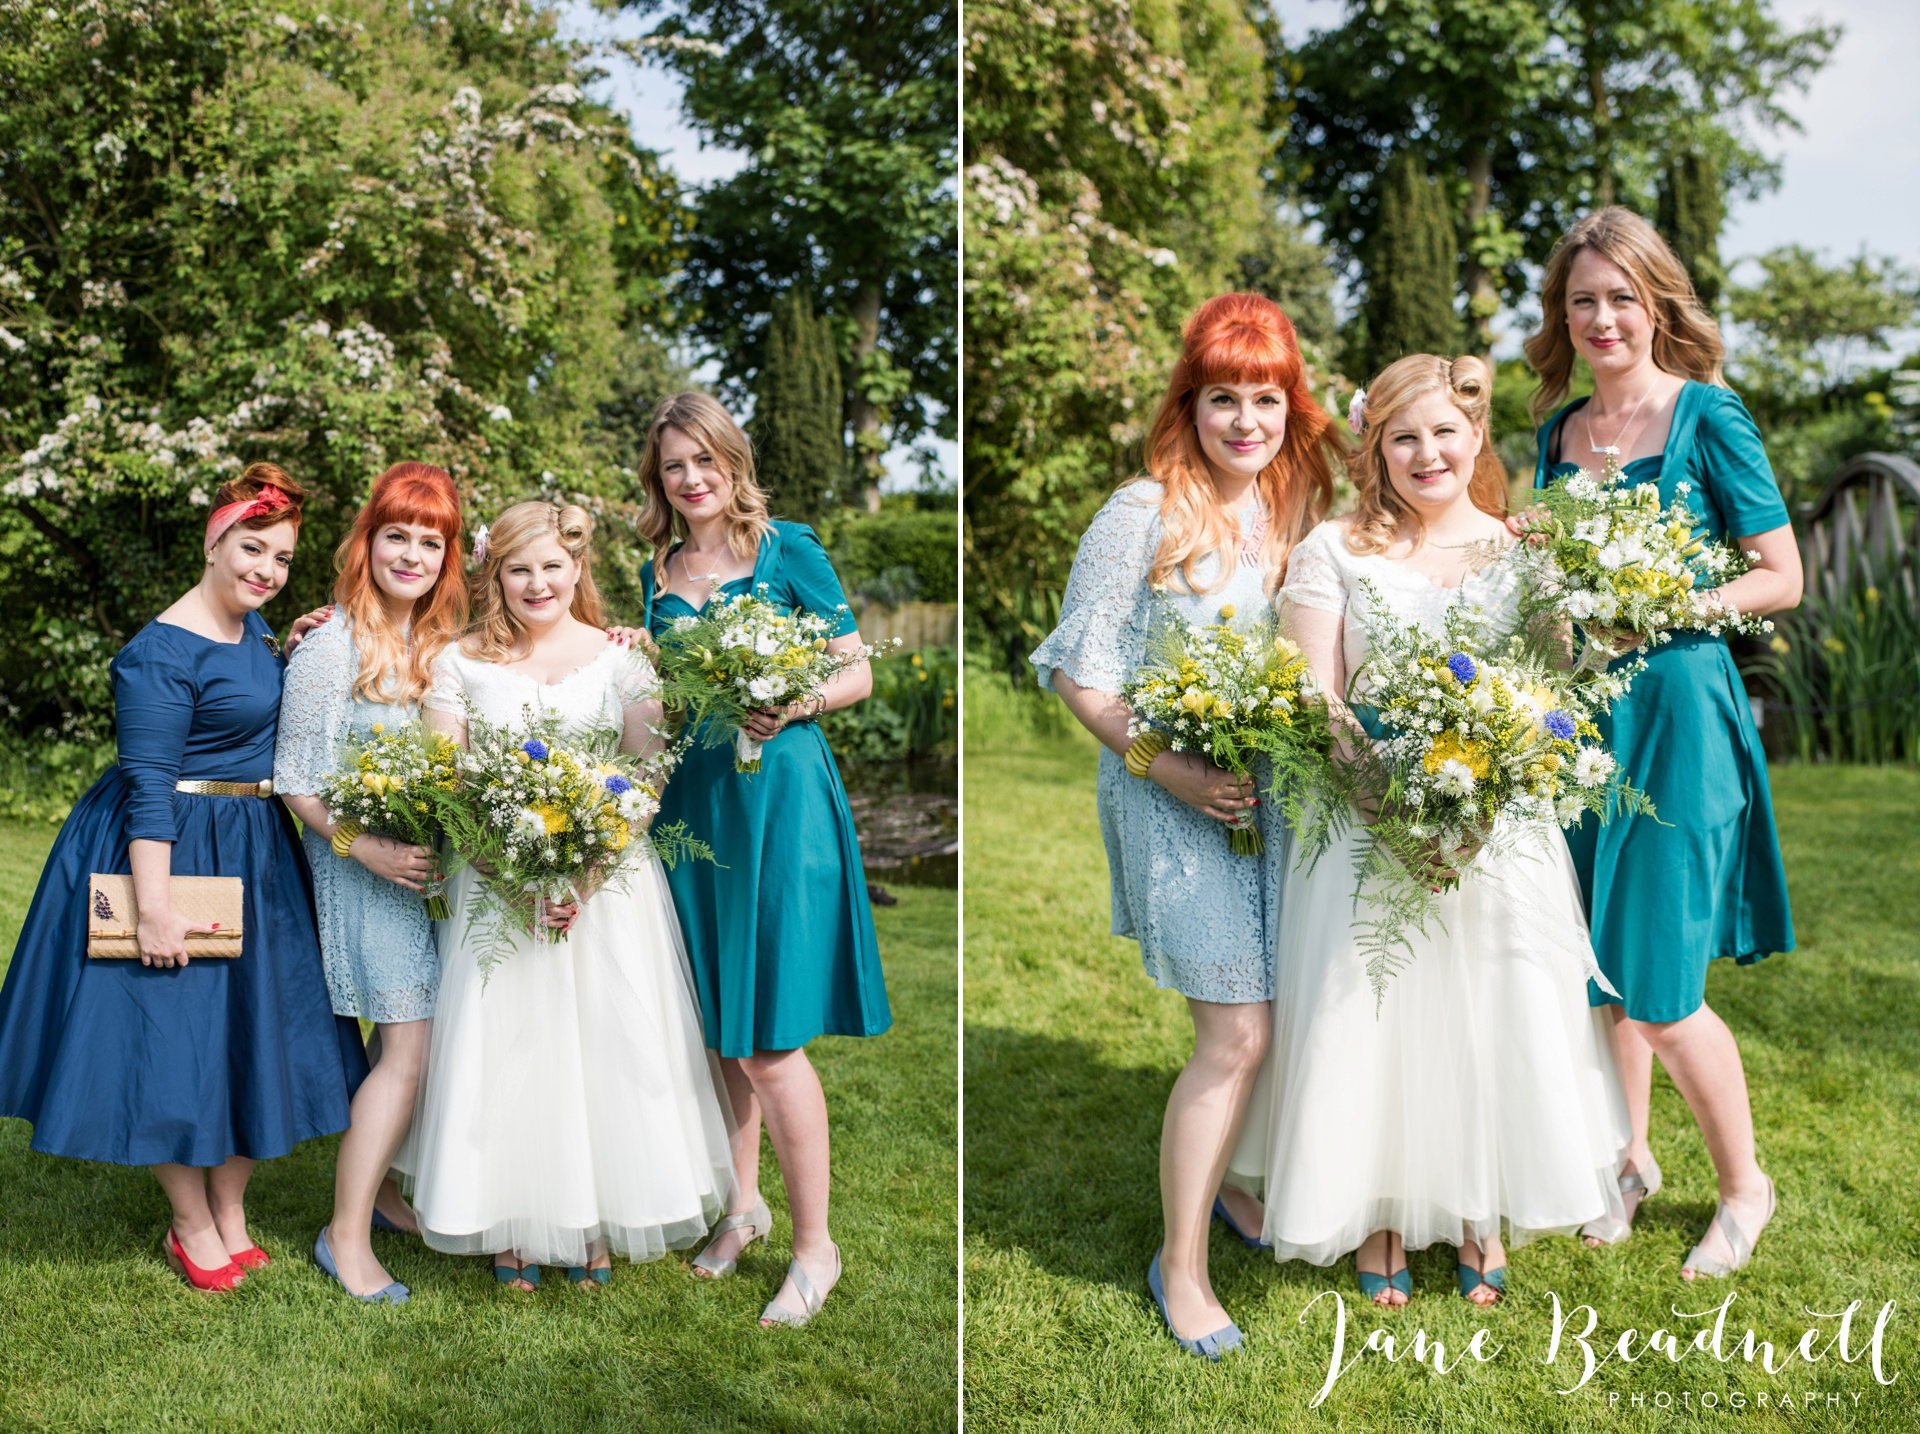 South Farm Wedding photography Hertfordshire by Jane Beadnell Photography fine art wedding photographer_0099